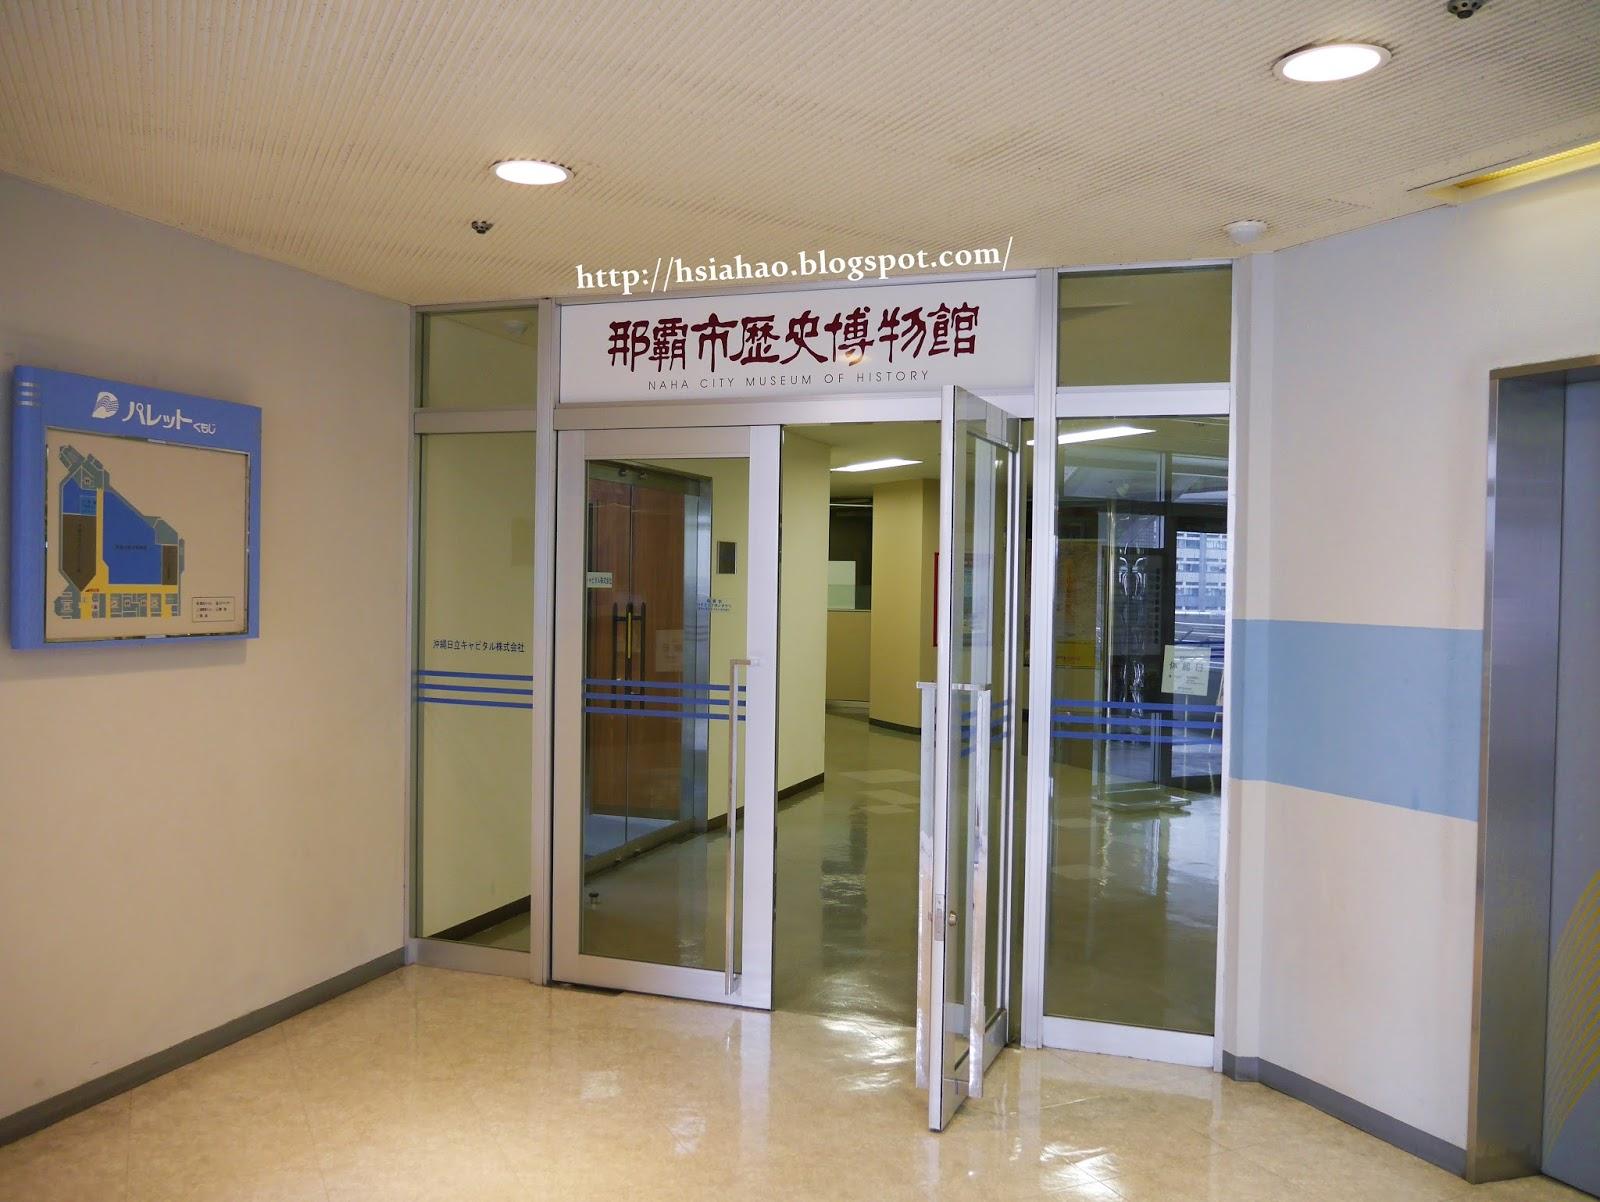 沖繩-那霸市歷史博物館-Okinawa-naha-city-museum-of-history